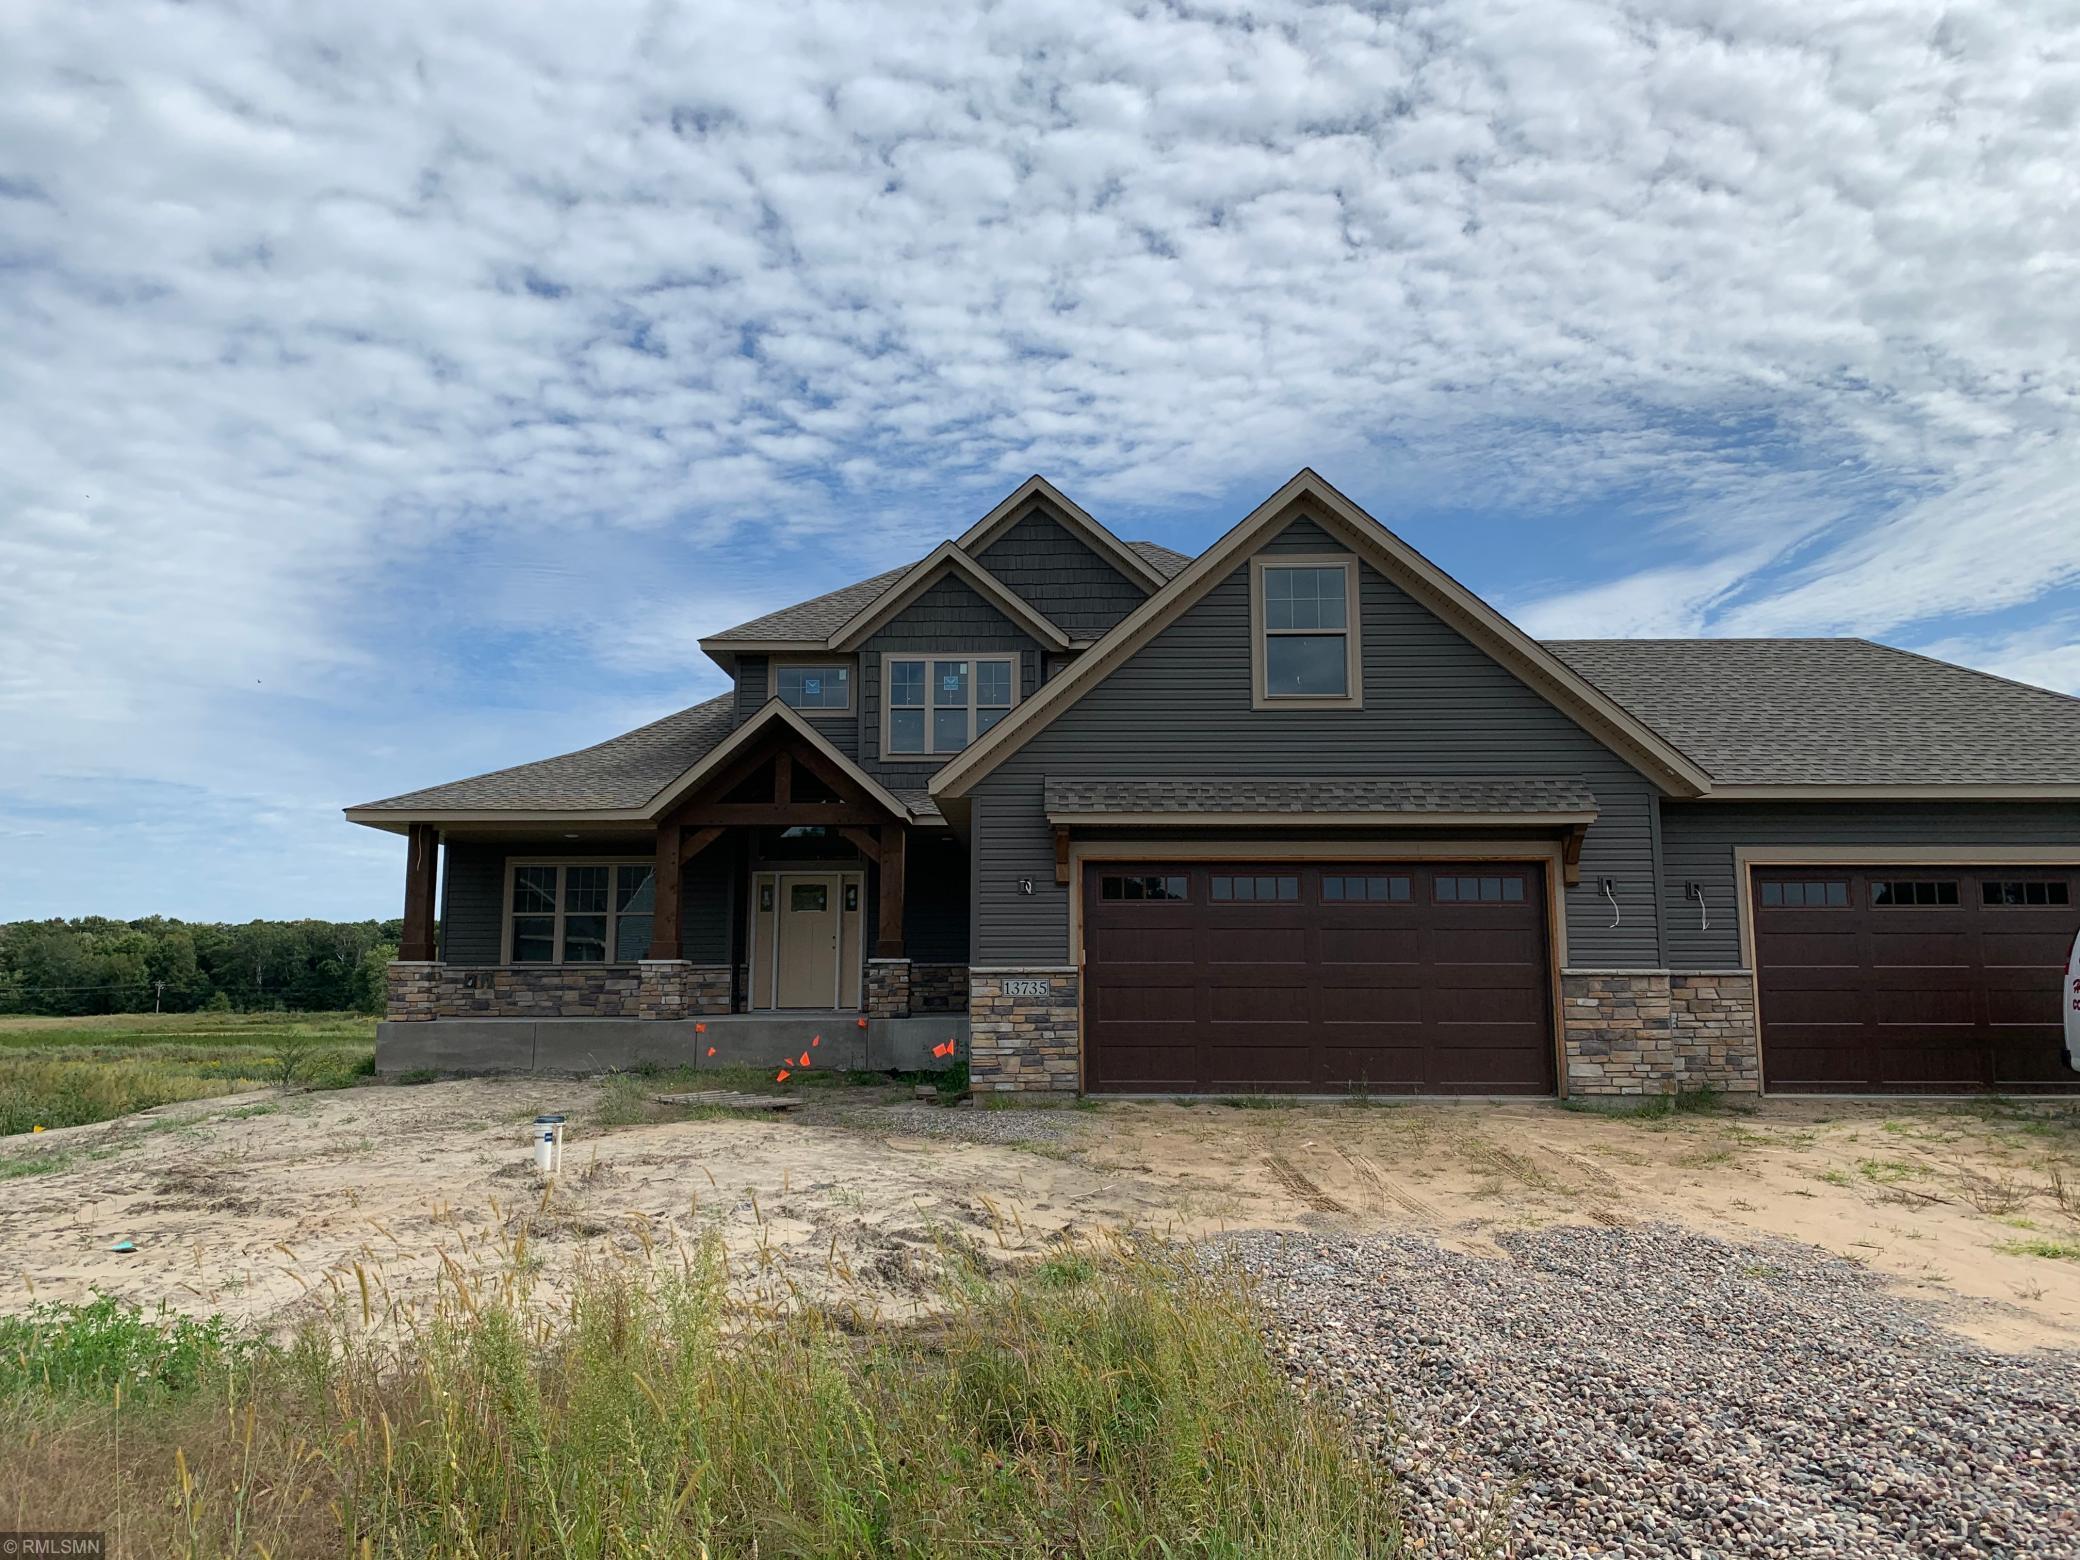 13735 Isetta Property Photo - Ham Lake, MN real estate listing